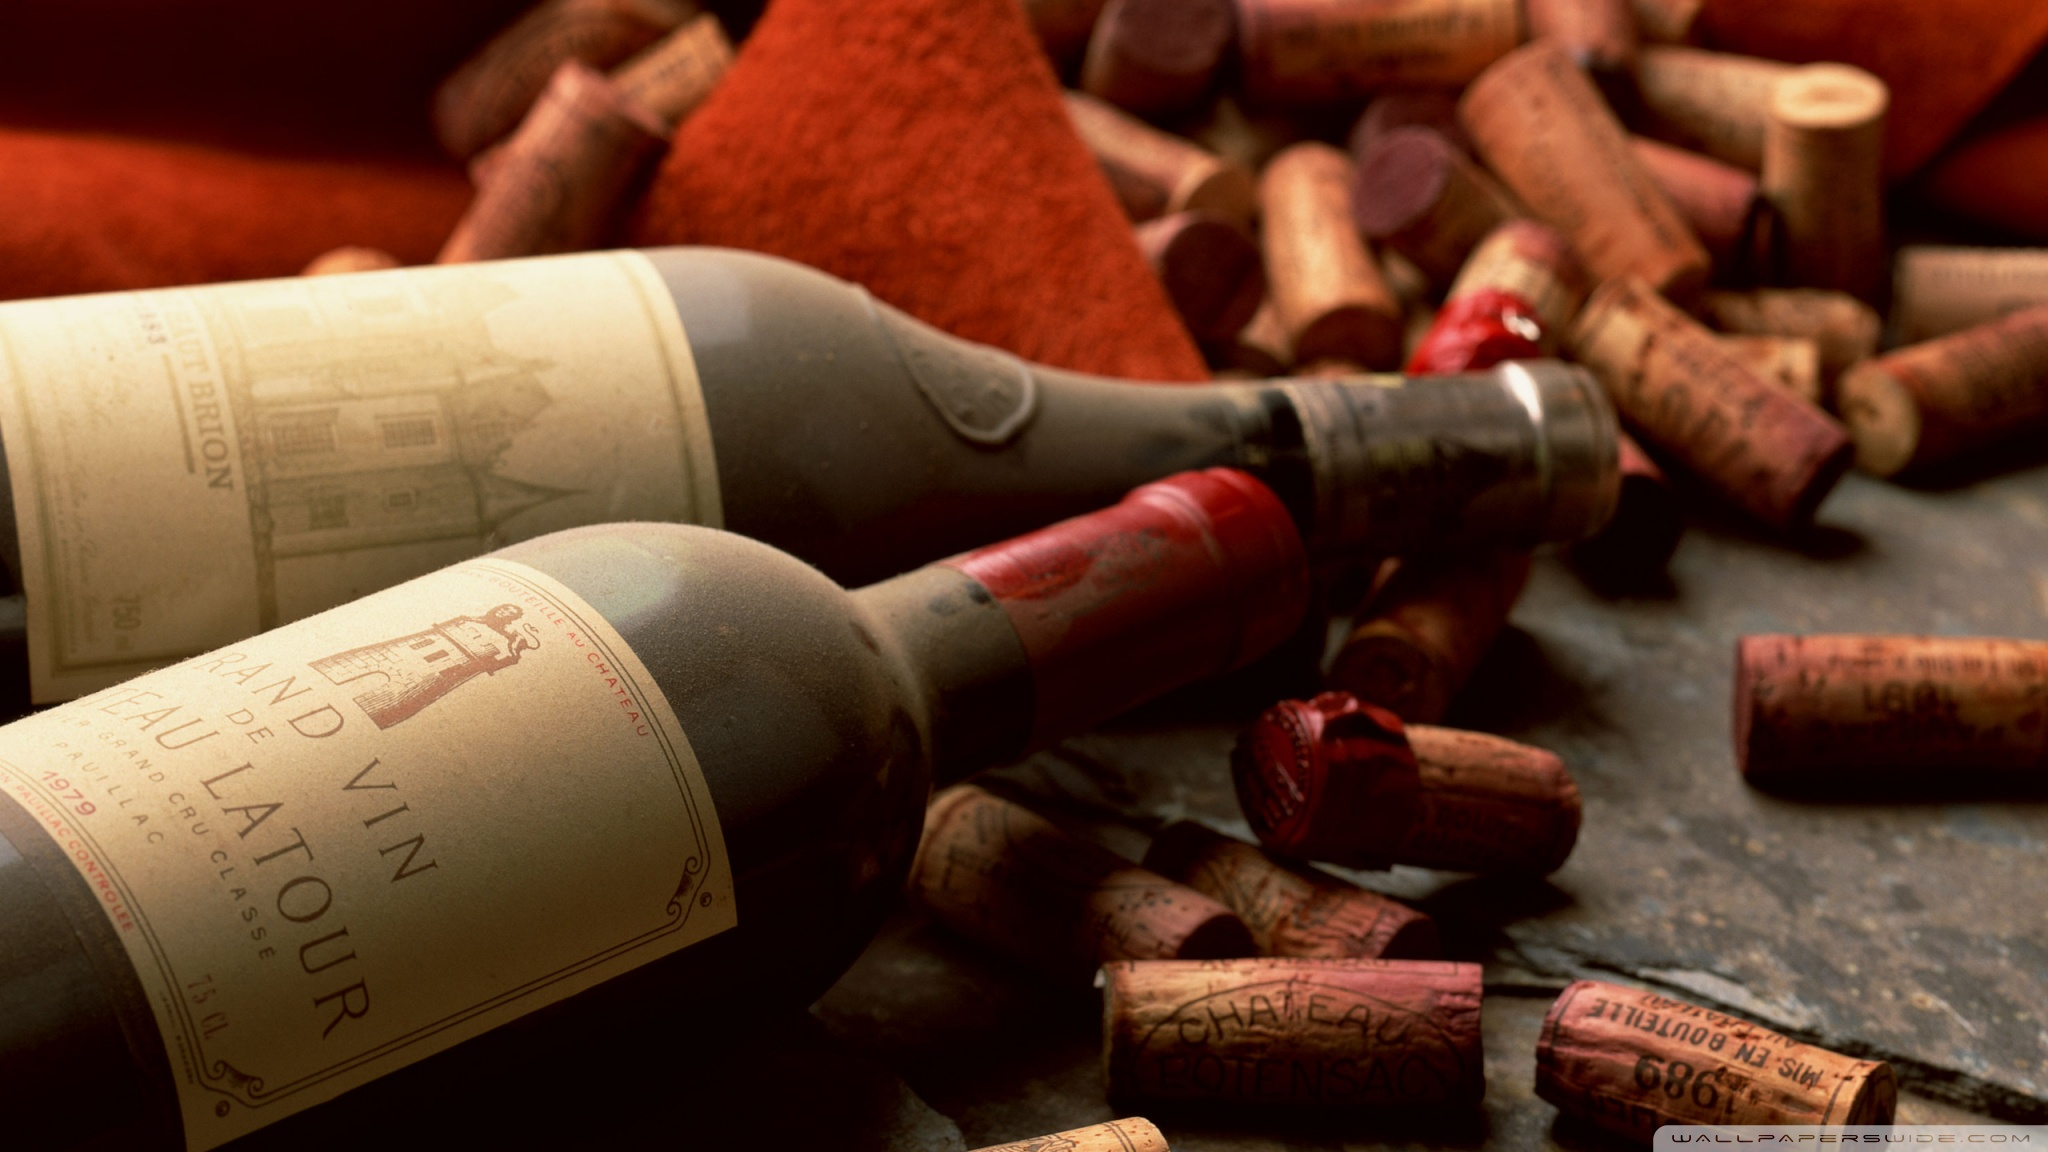 вина пробки для вина скачать фото обои ...: fotodes.ru/download/3721